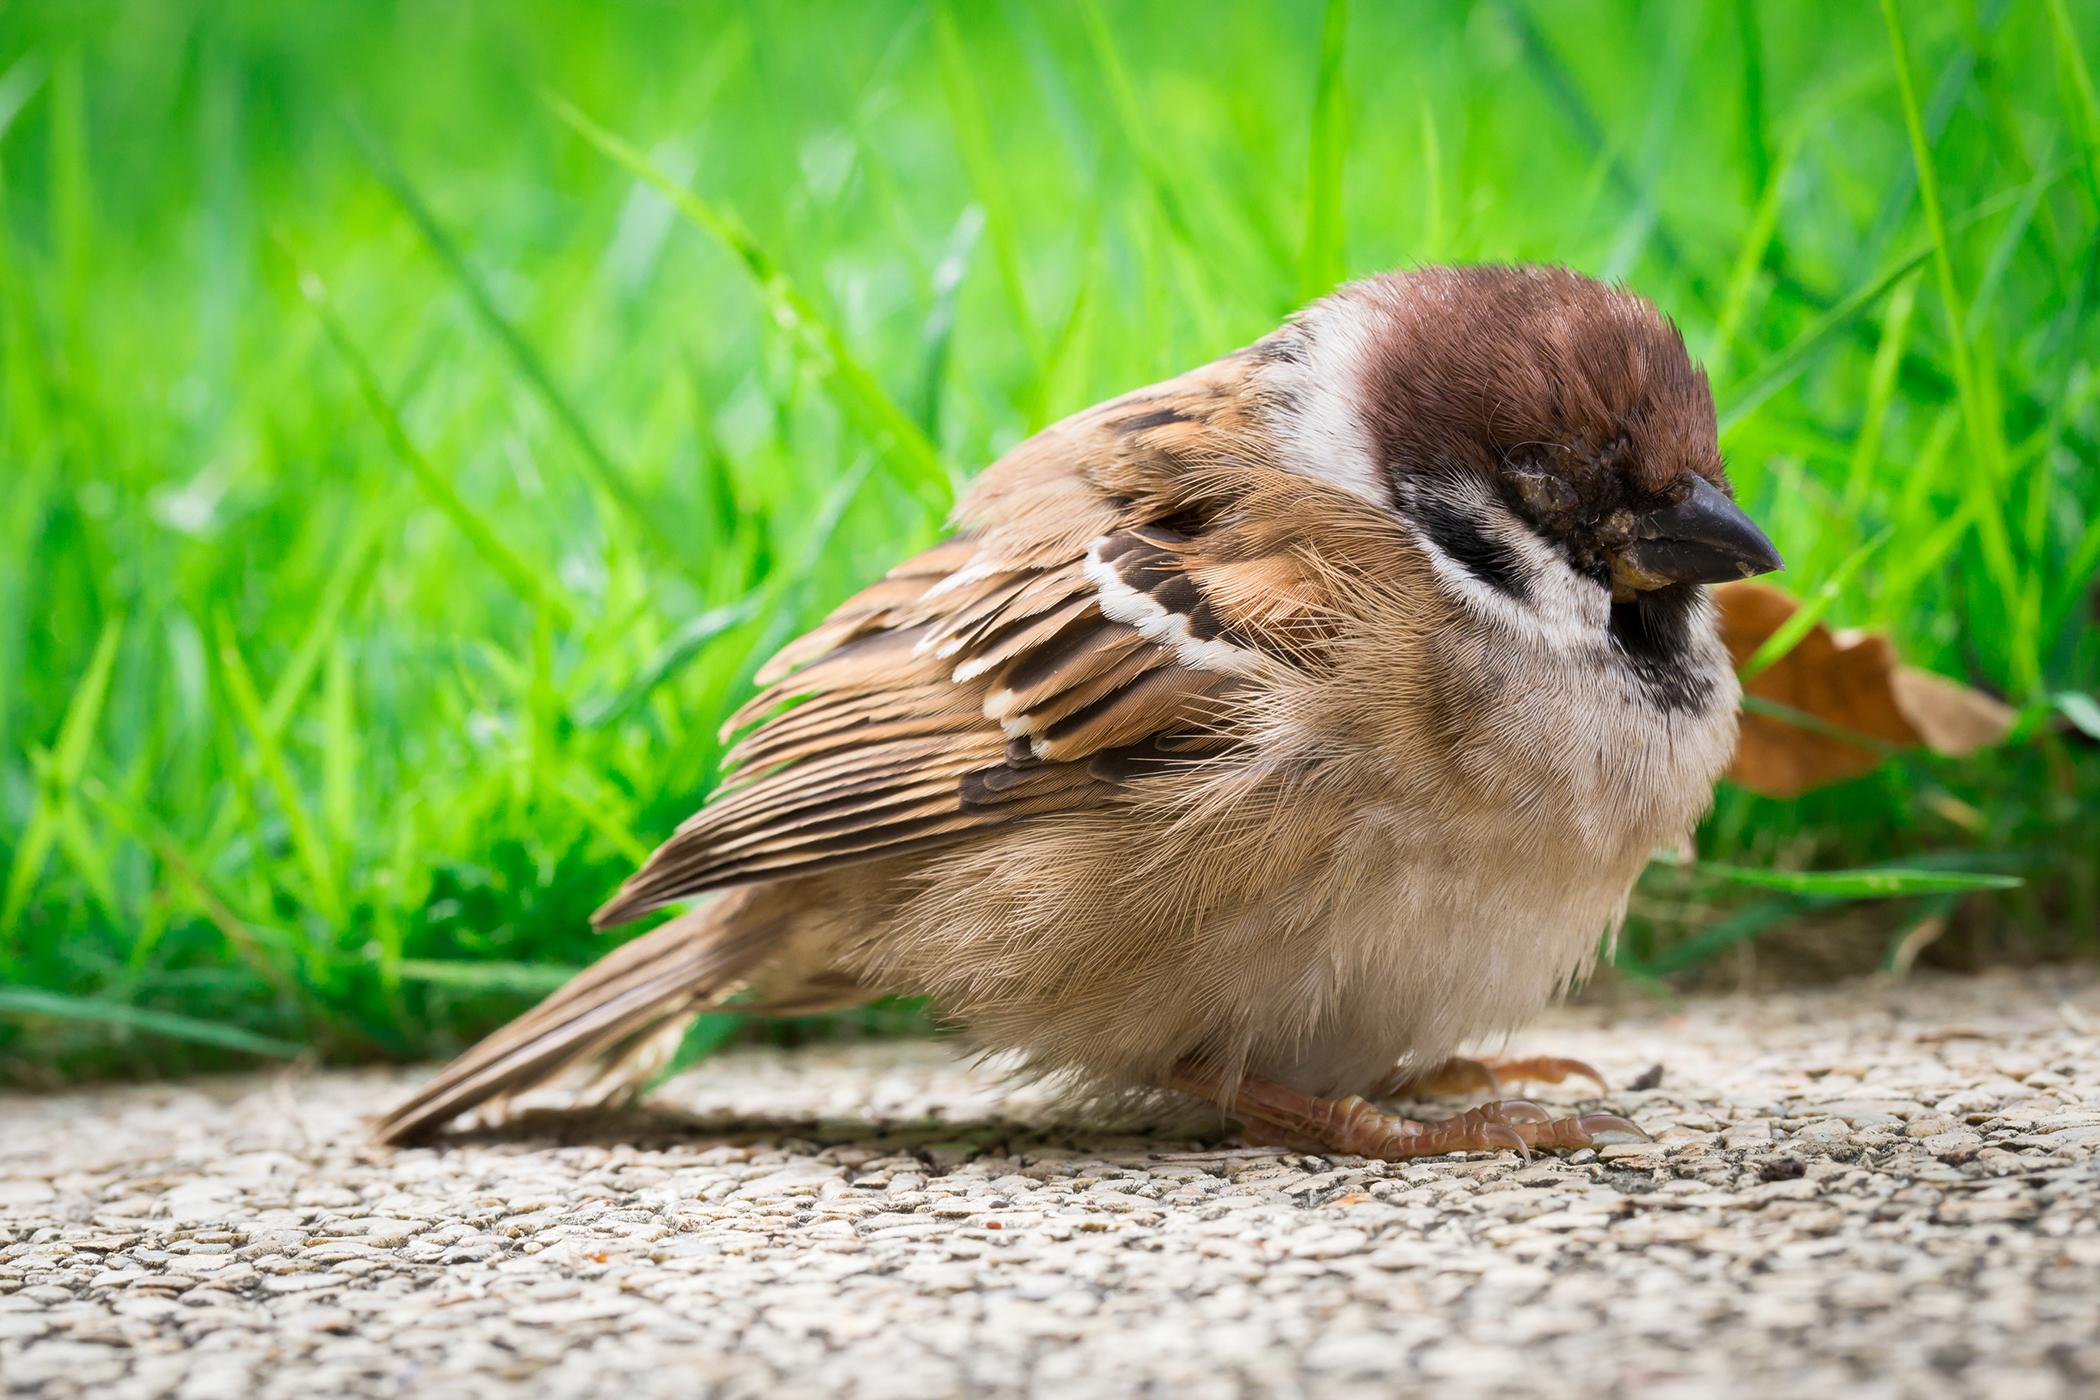 Influenza in Birds